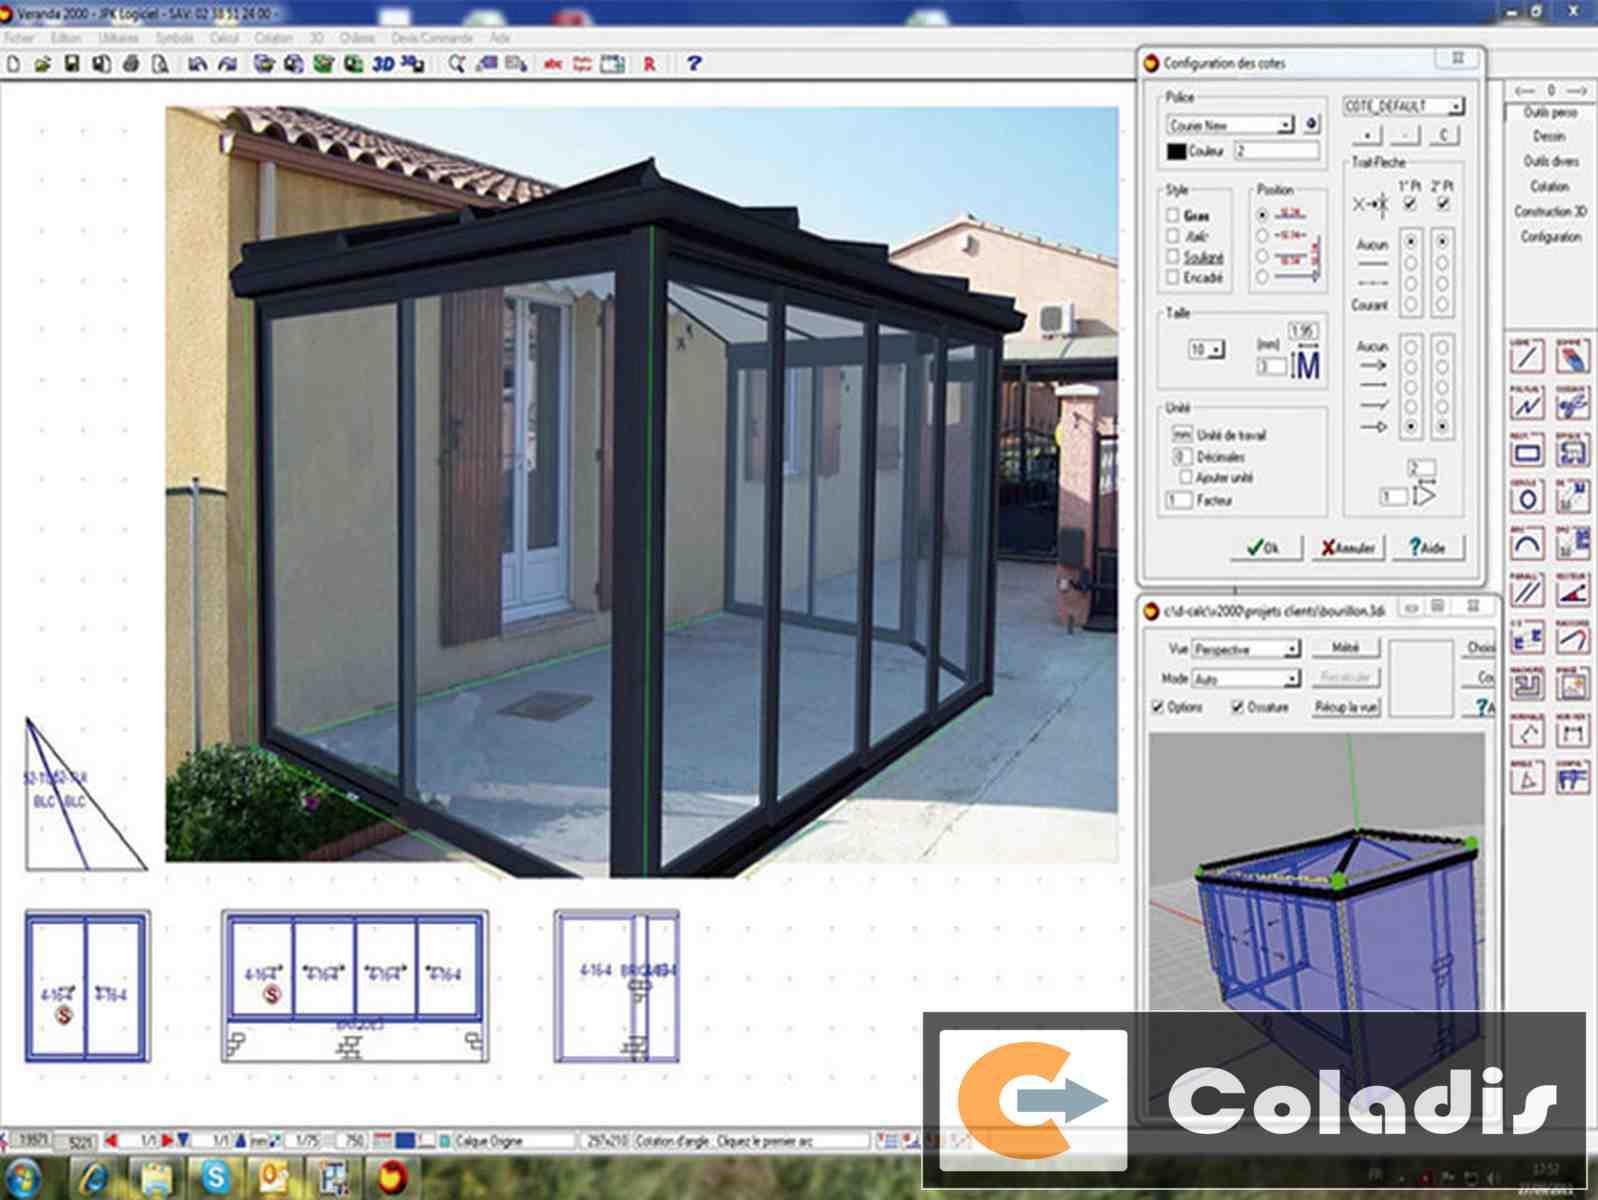 Coladis exemple logiciel véranda conception 3D